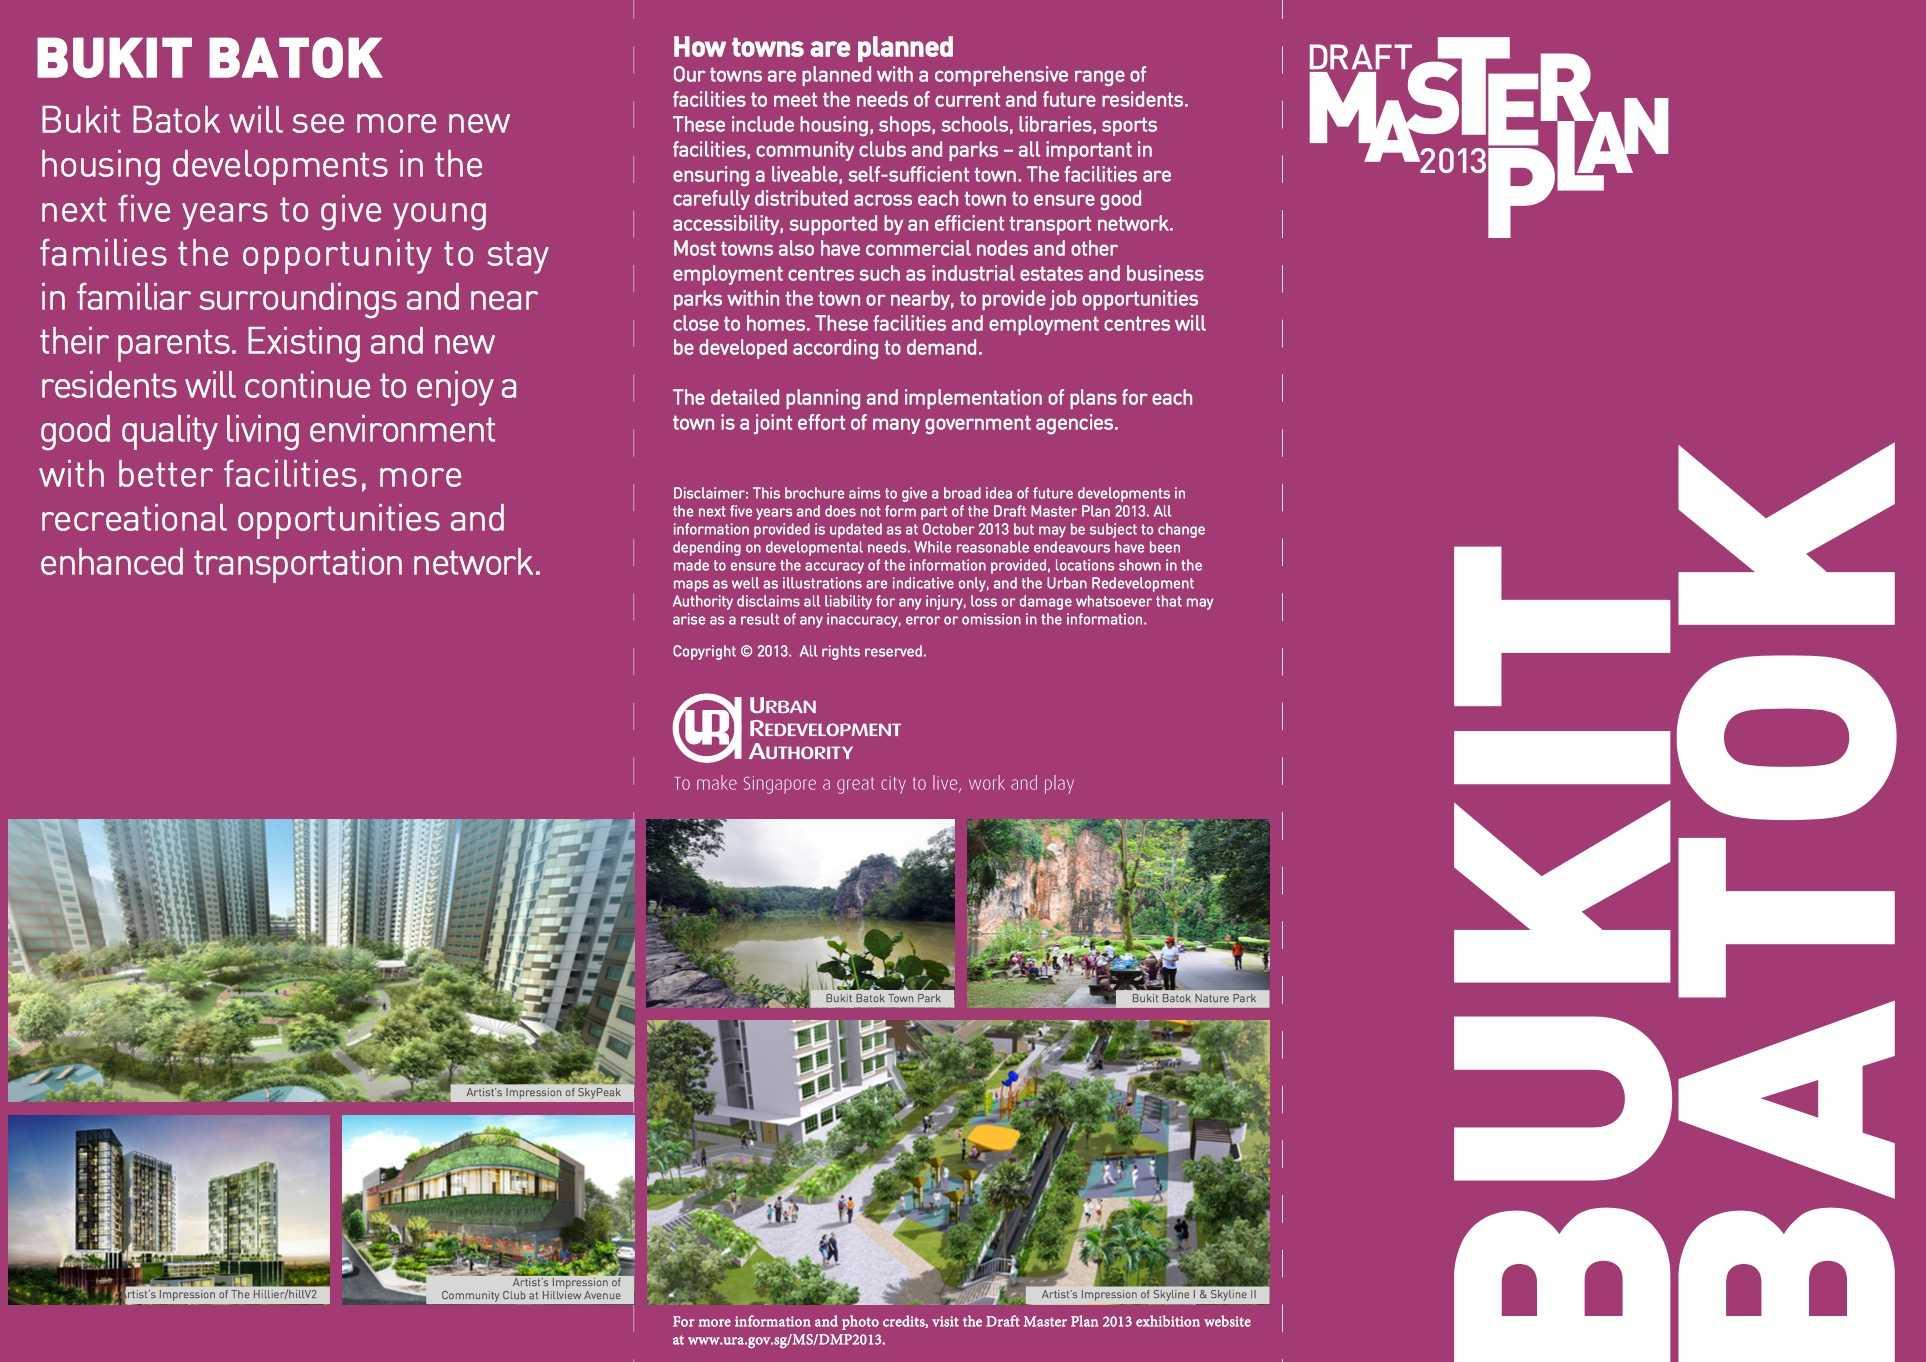 Le-Quest-Bukit-Batok-MasterPlan-1